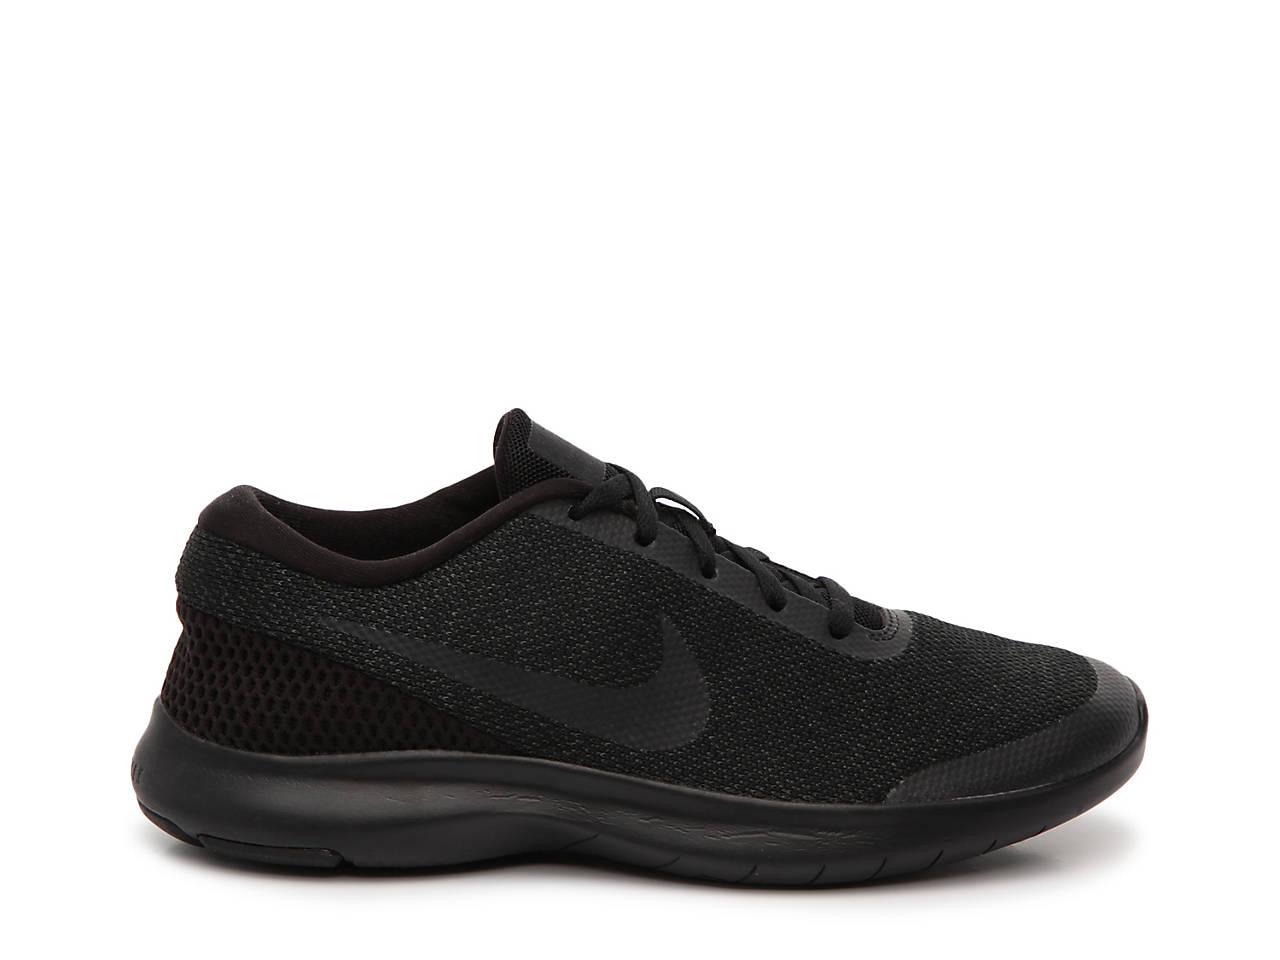 3c44ef76232c Nike Flex Experience RN 7 Lightweight Running Shoe - Women s Women s ...